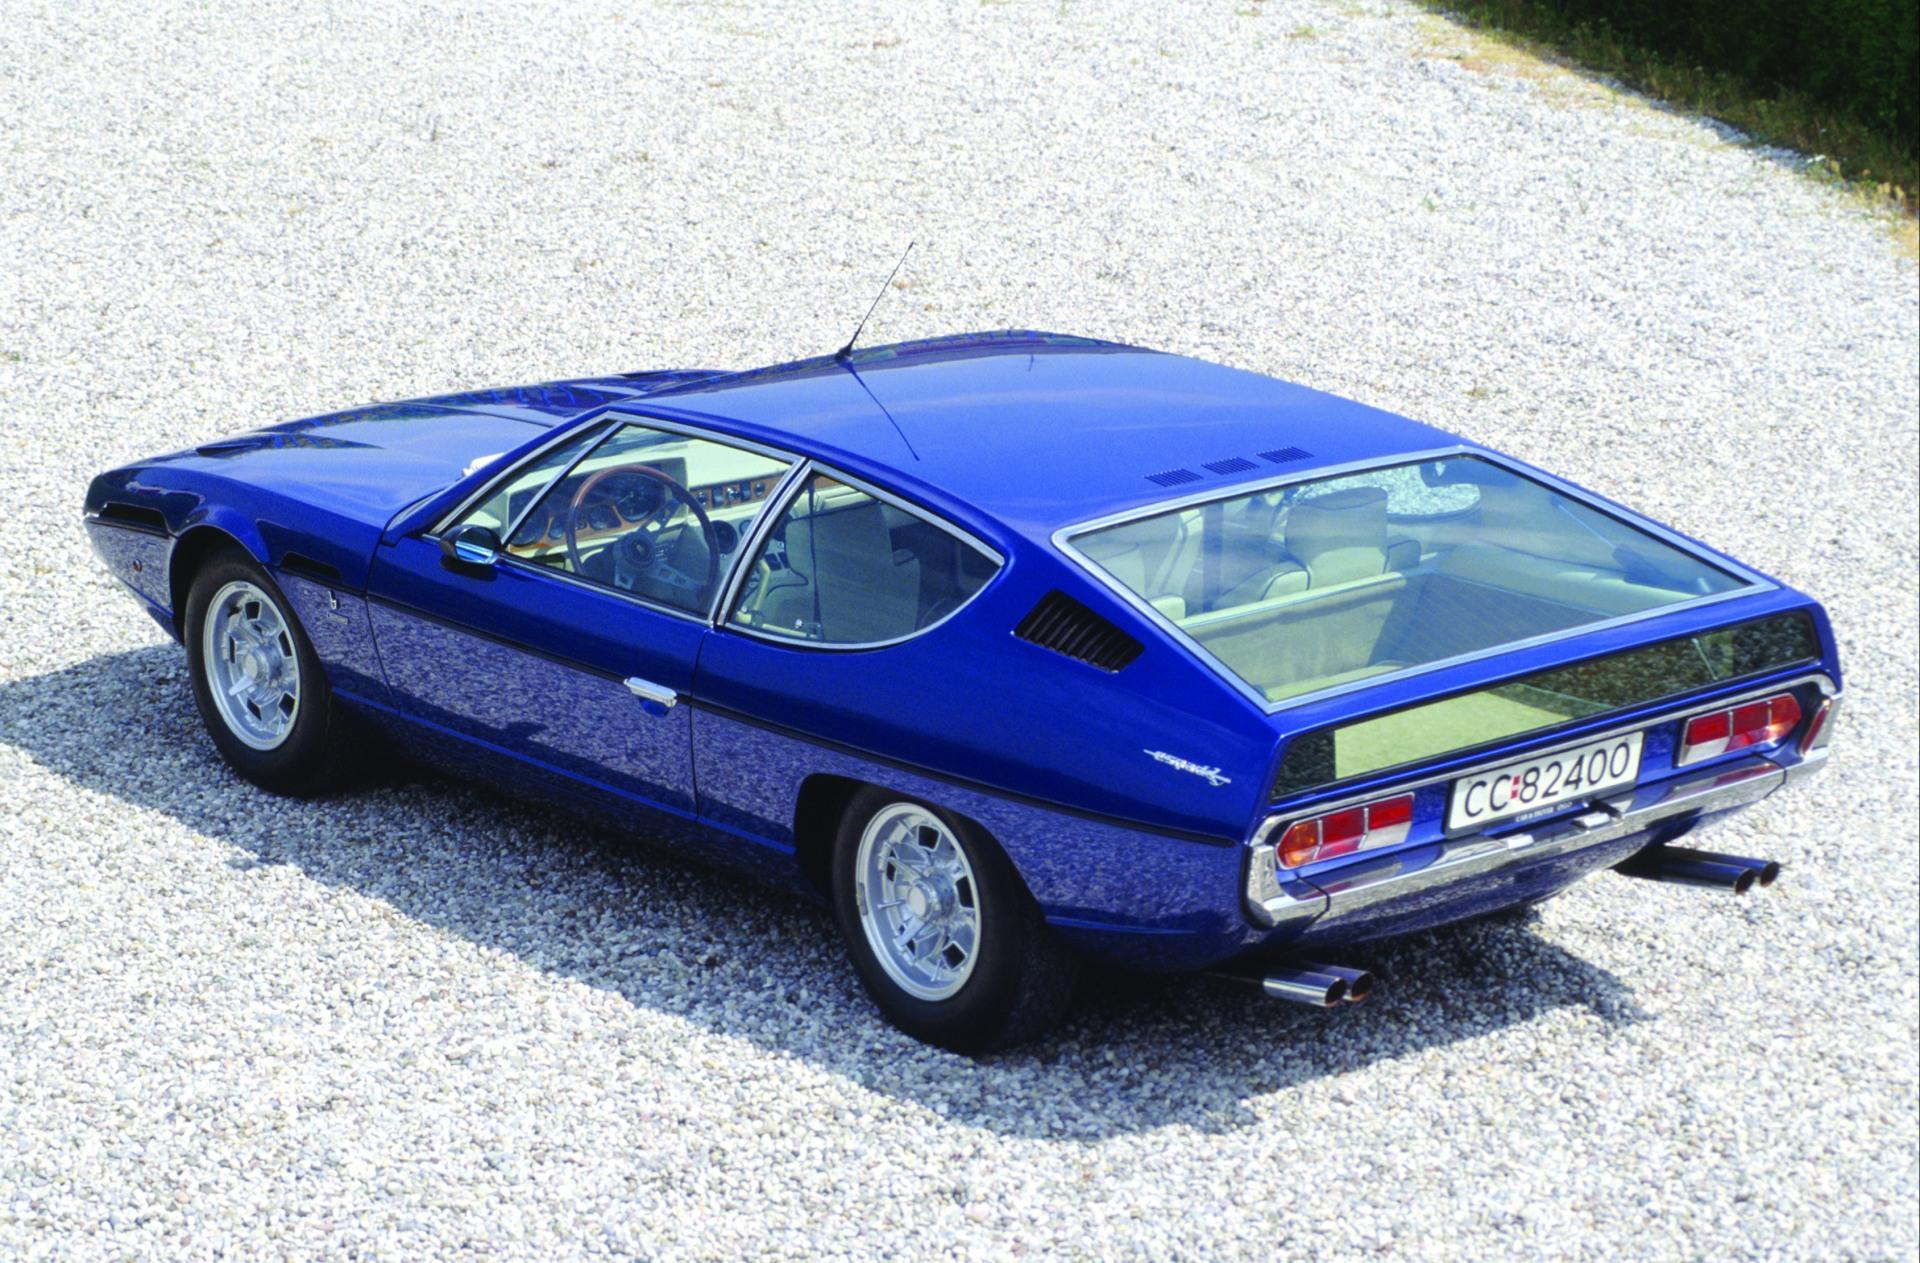 https://www.conceptcarz.com/images/Lamborghini/1968-Lamborghini-Espada-Coupe-Image-04.jpg